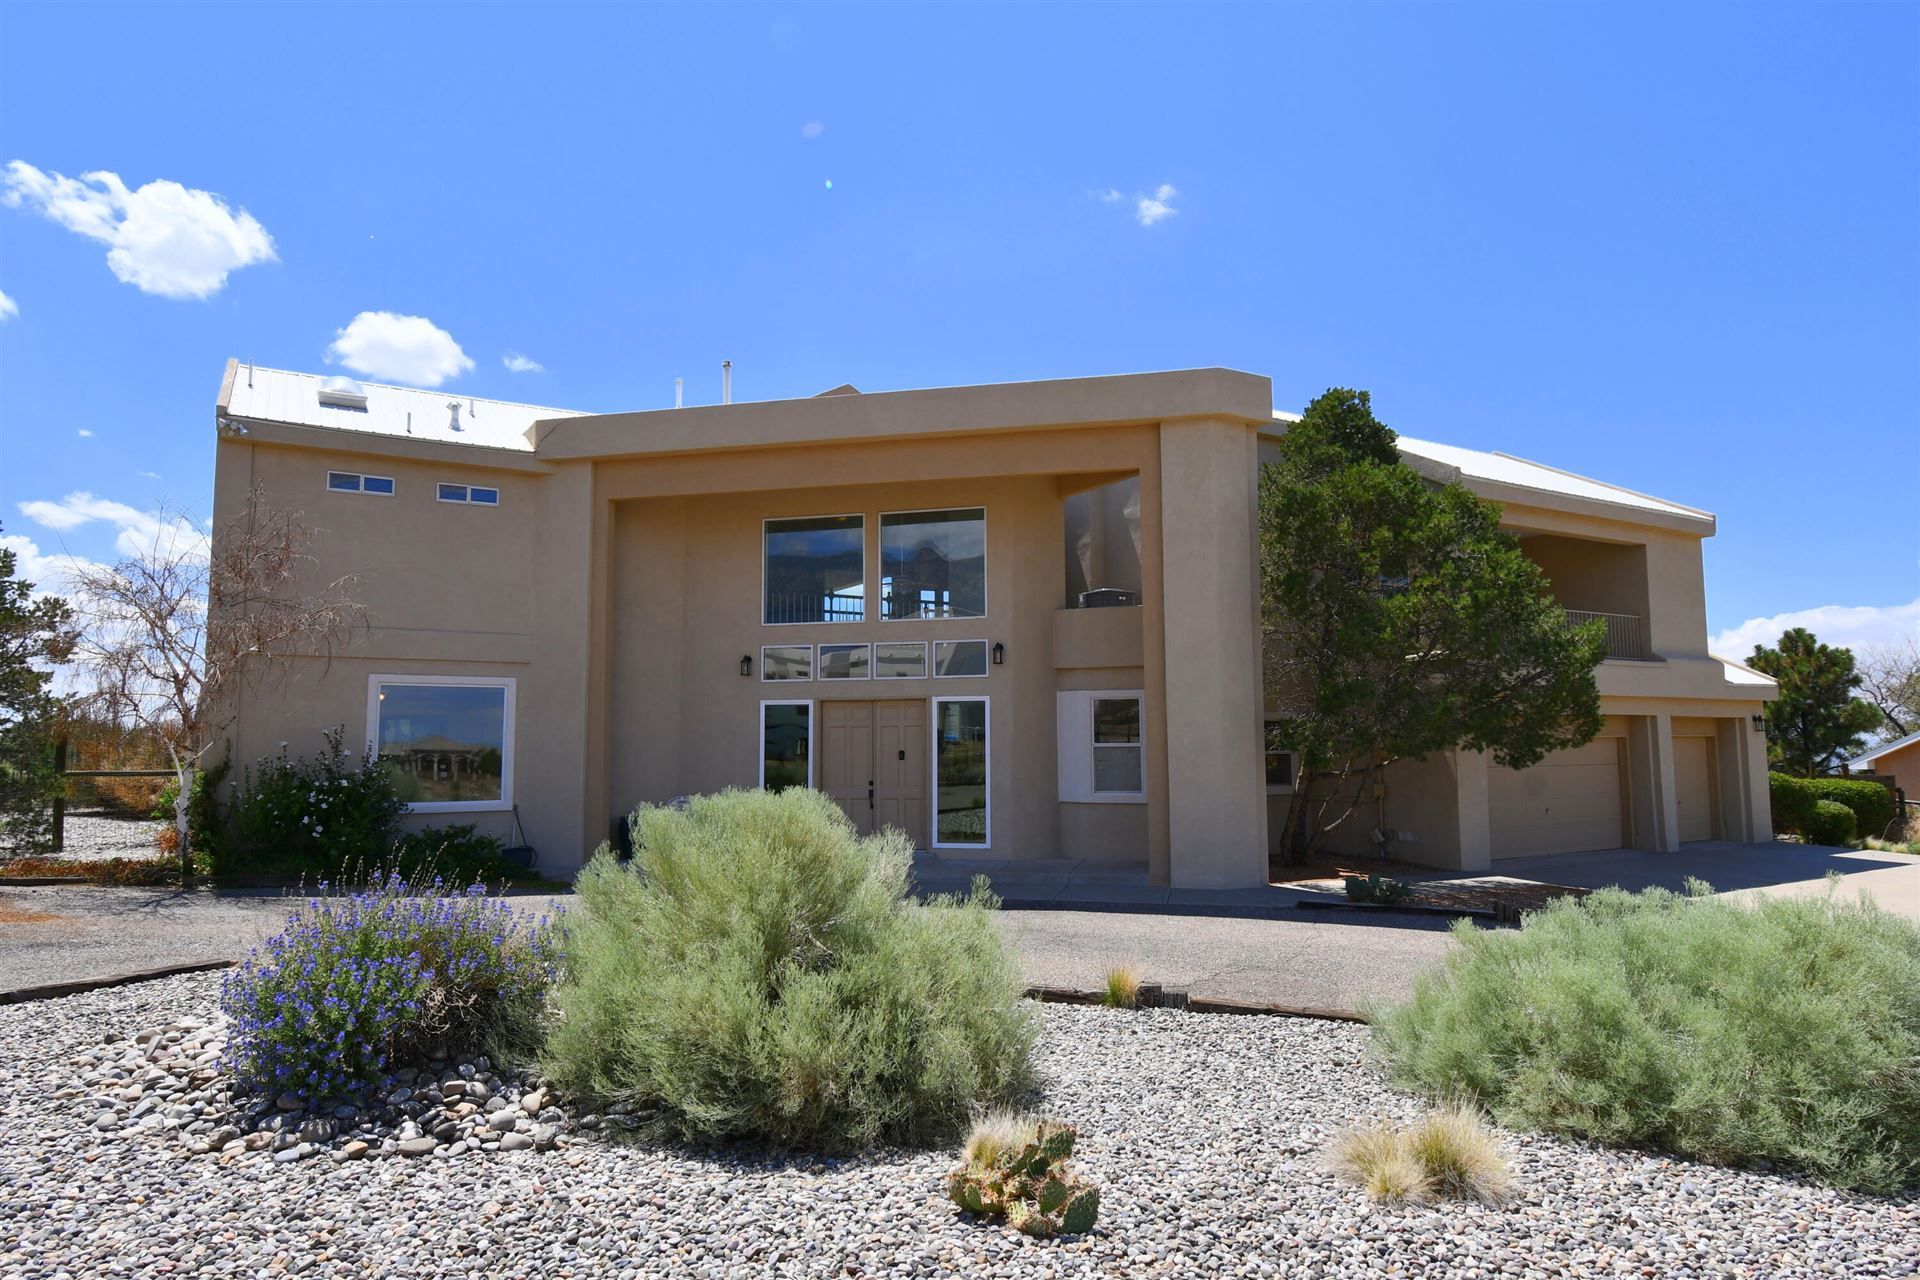 Photo of 9770 ELENA Drive NE, Albuquerque, NM 87122 (MLS # 999877)